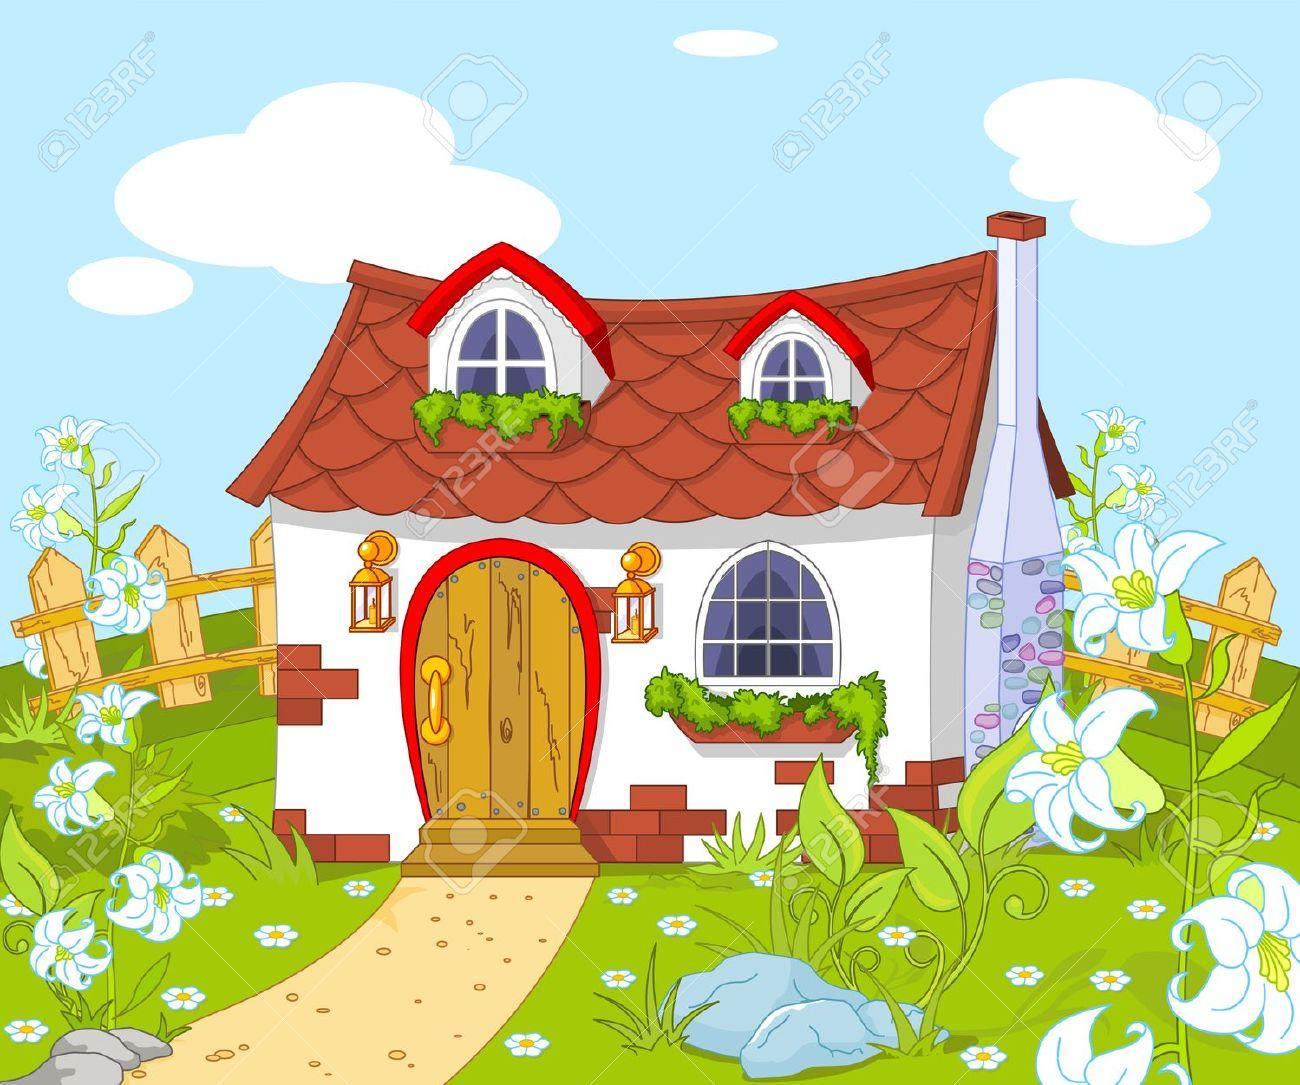 haus mit garten comic – reimplica | juliedeane, Garten ideen